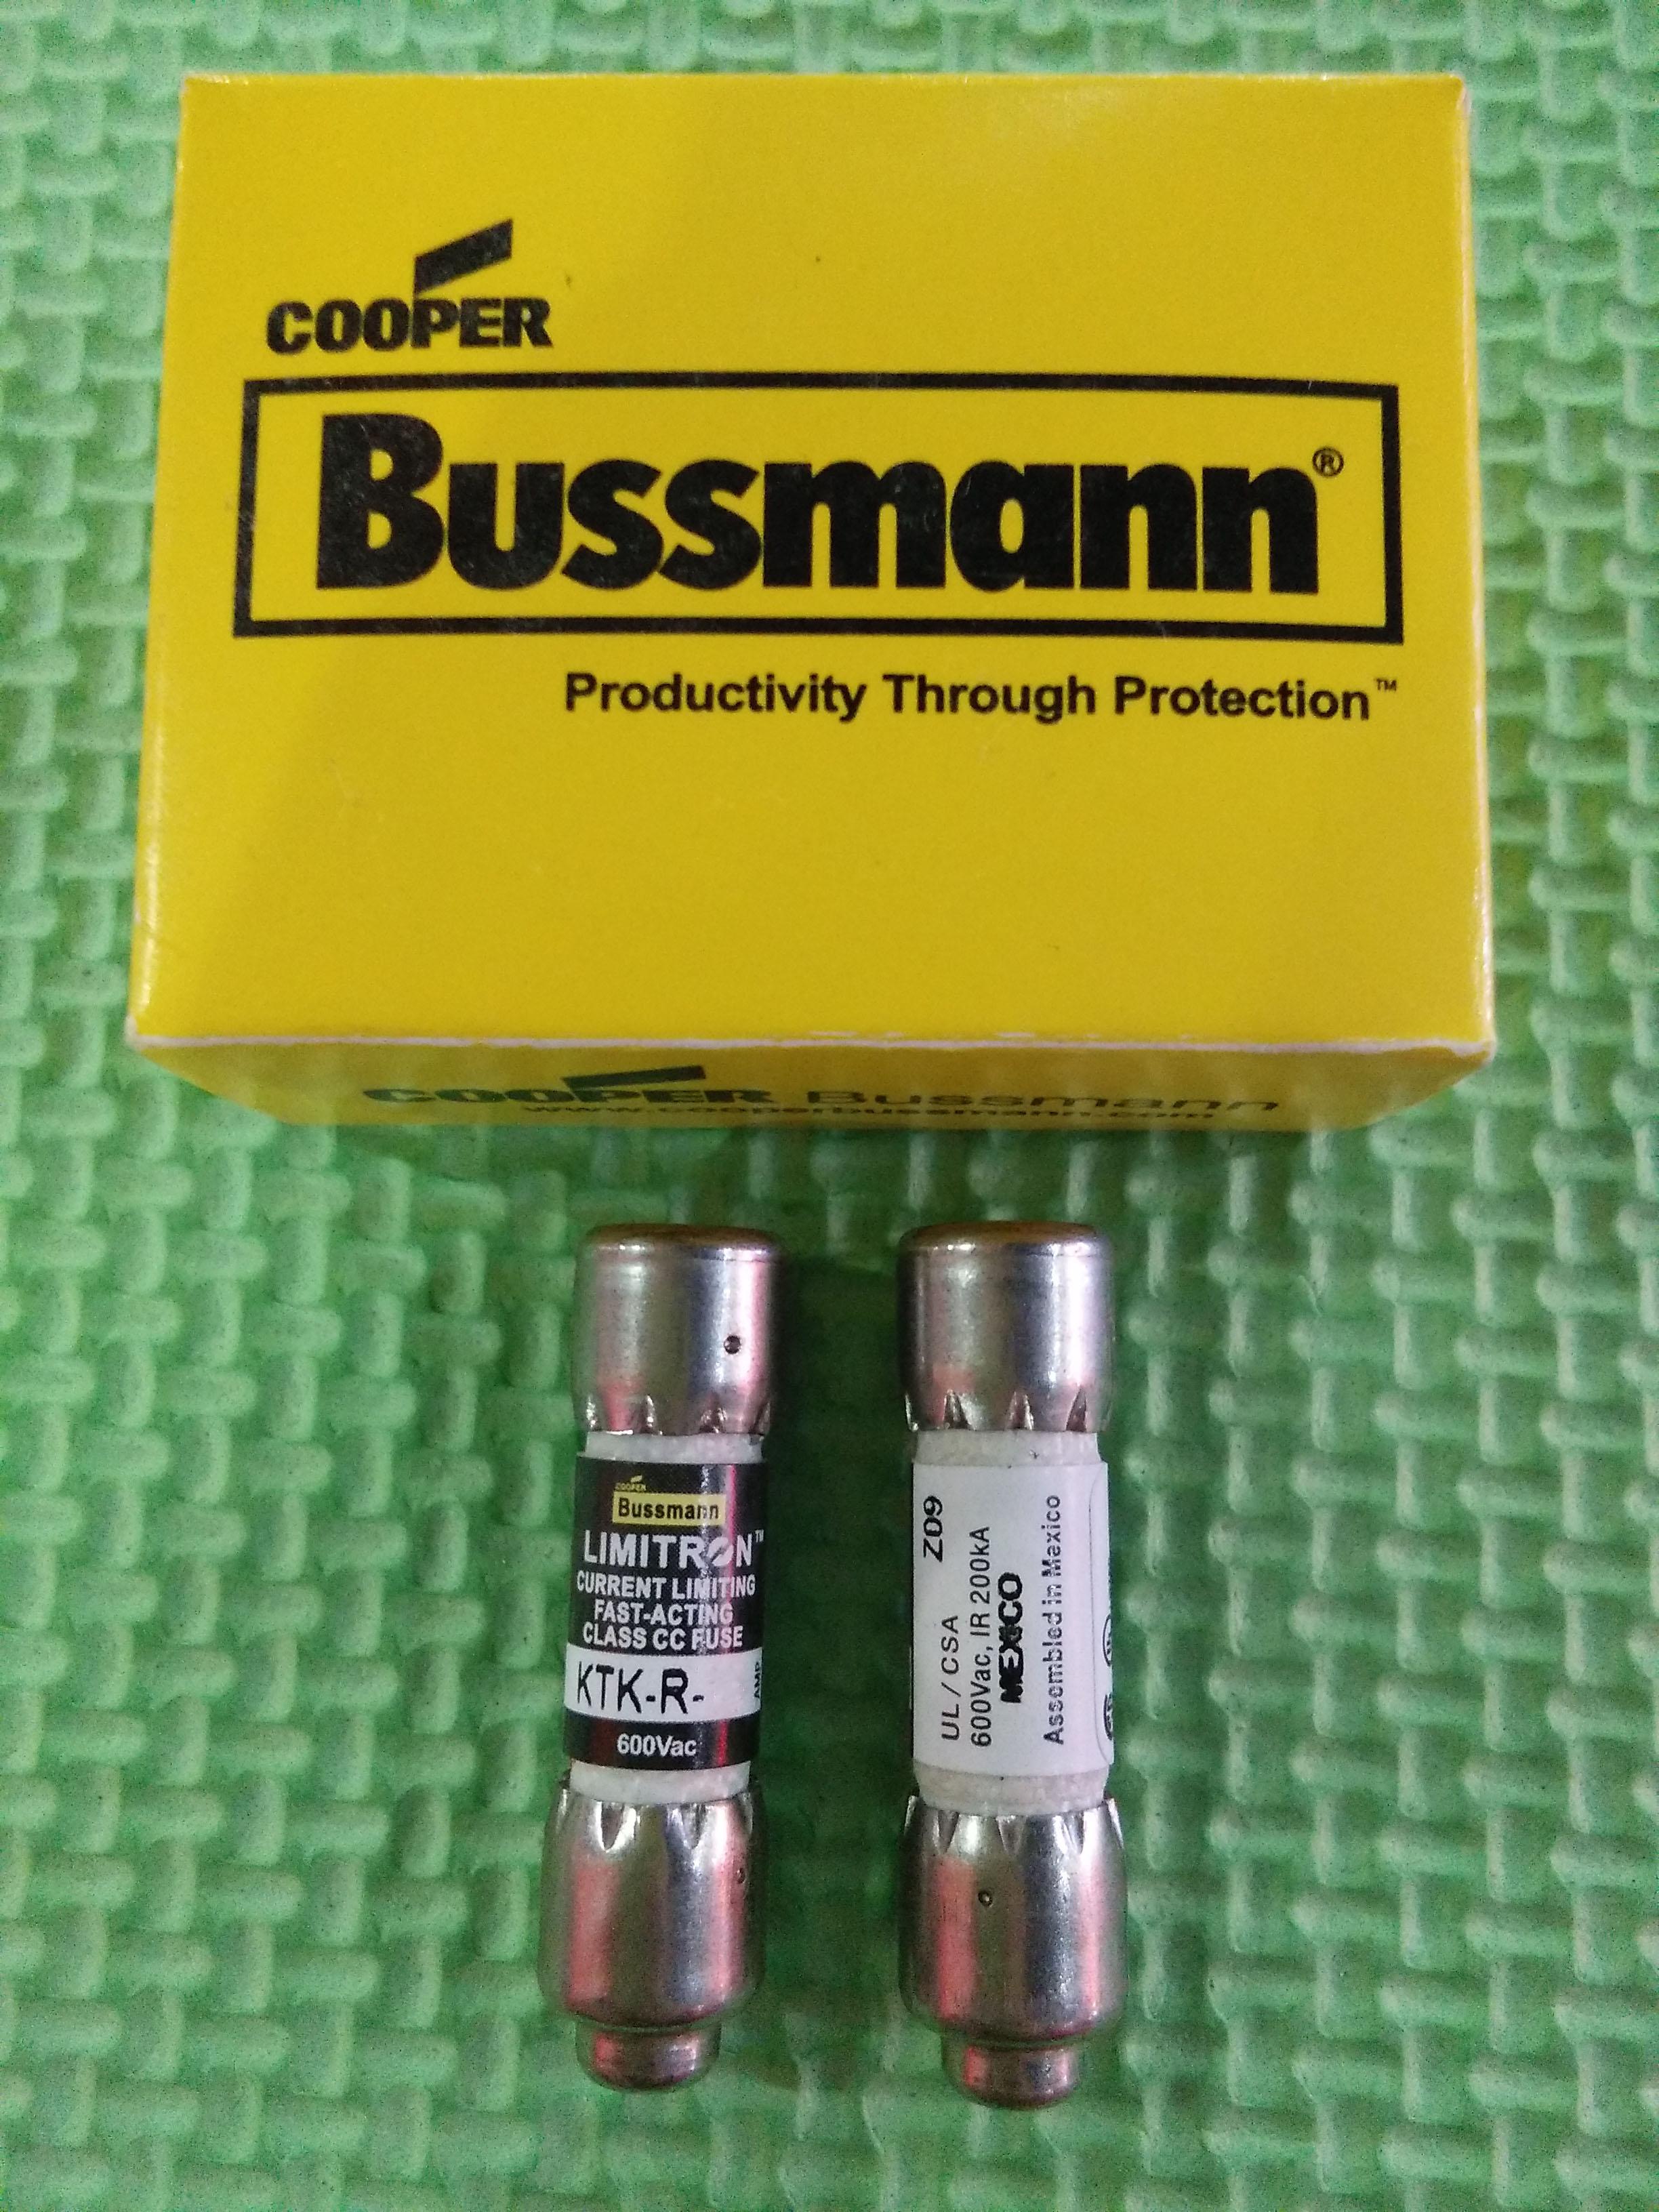 BUSSMANN KTK-R-1//4 Fuses USA Seller